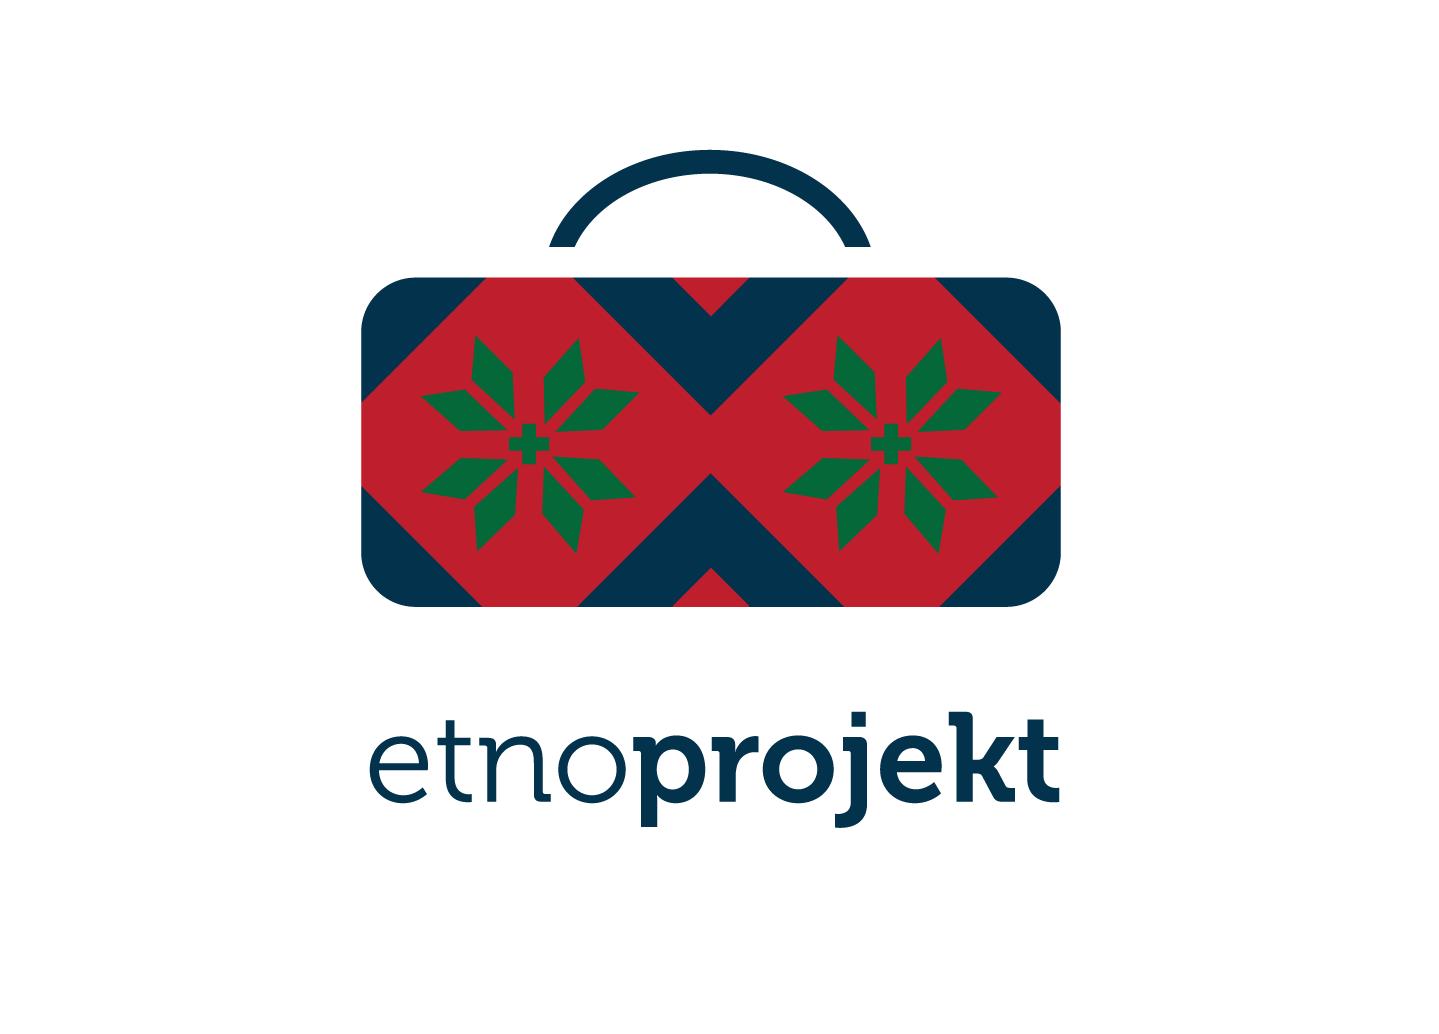 etnoprojekt 2011 logo